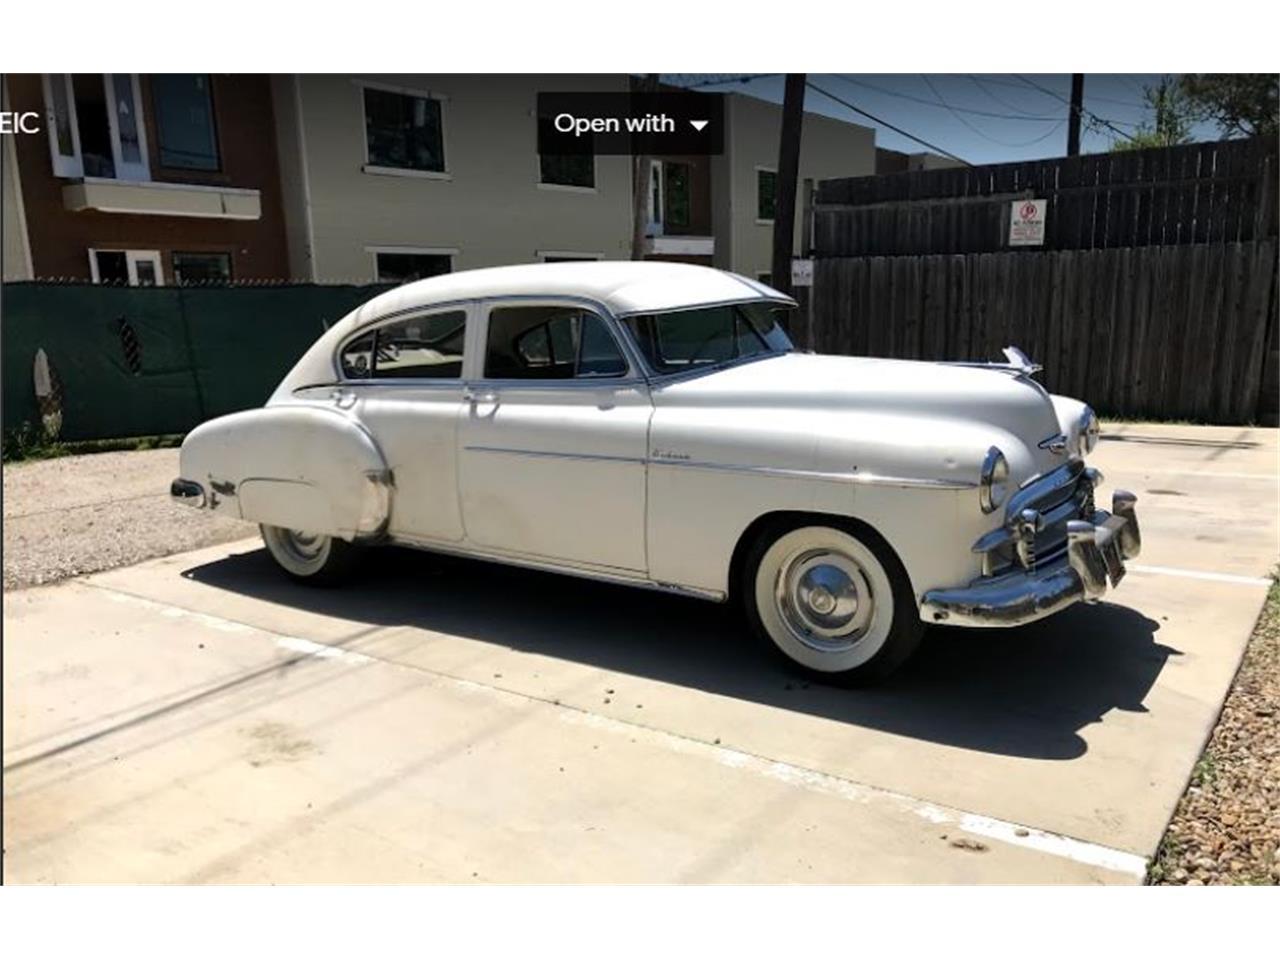 For Sale: 1950 Chevrolet Fleetline in Dallas, Texas